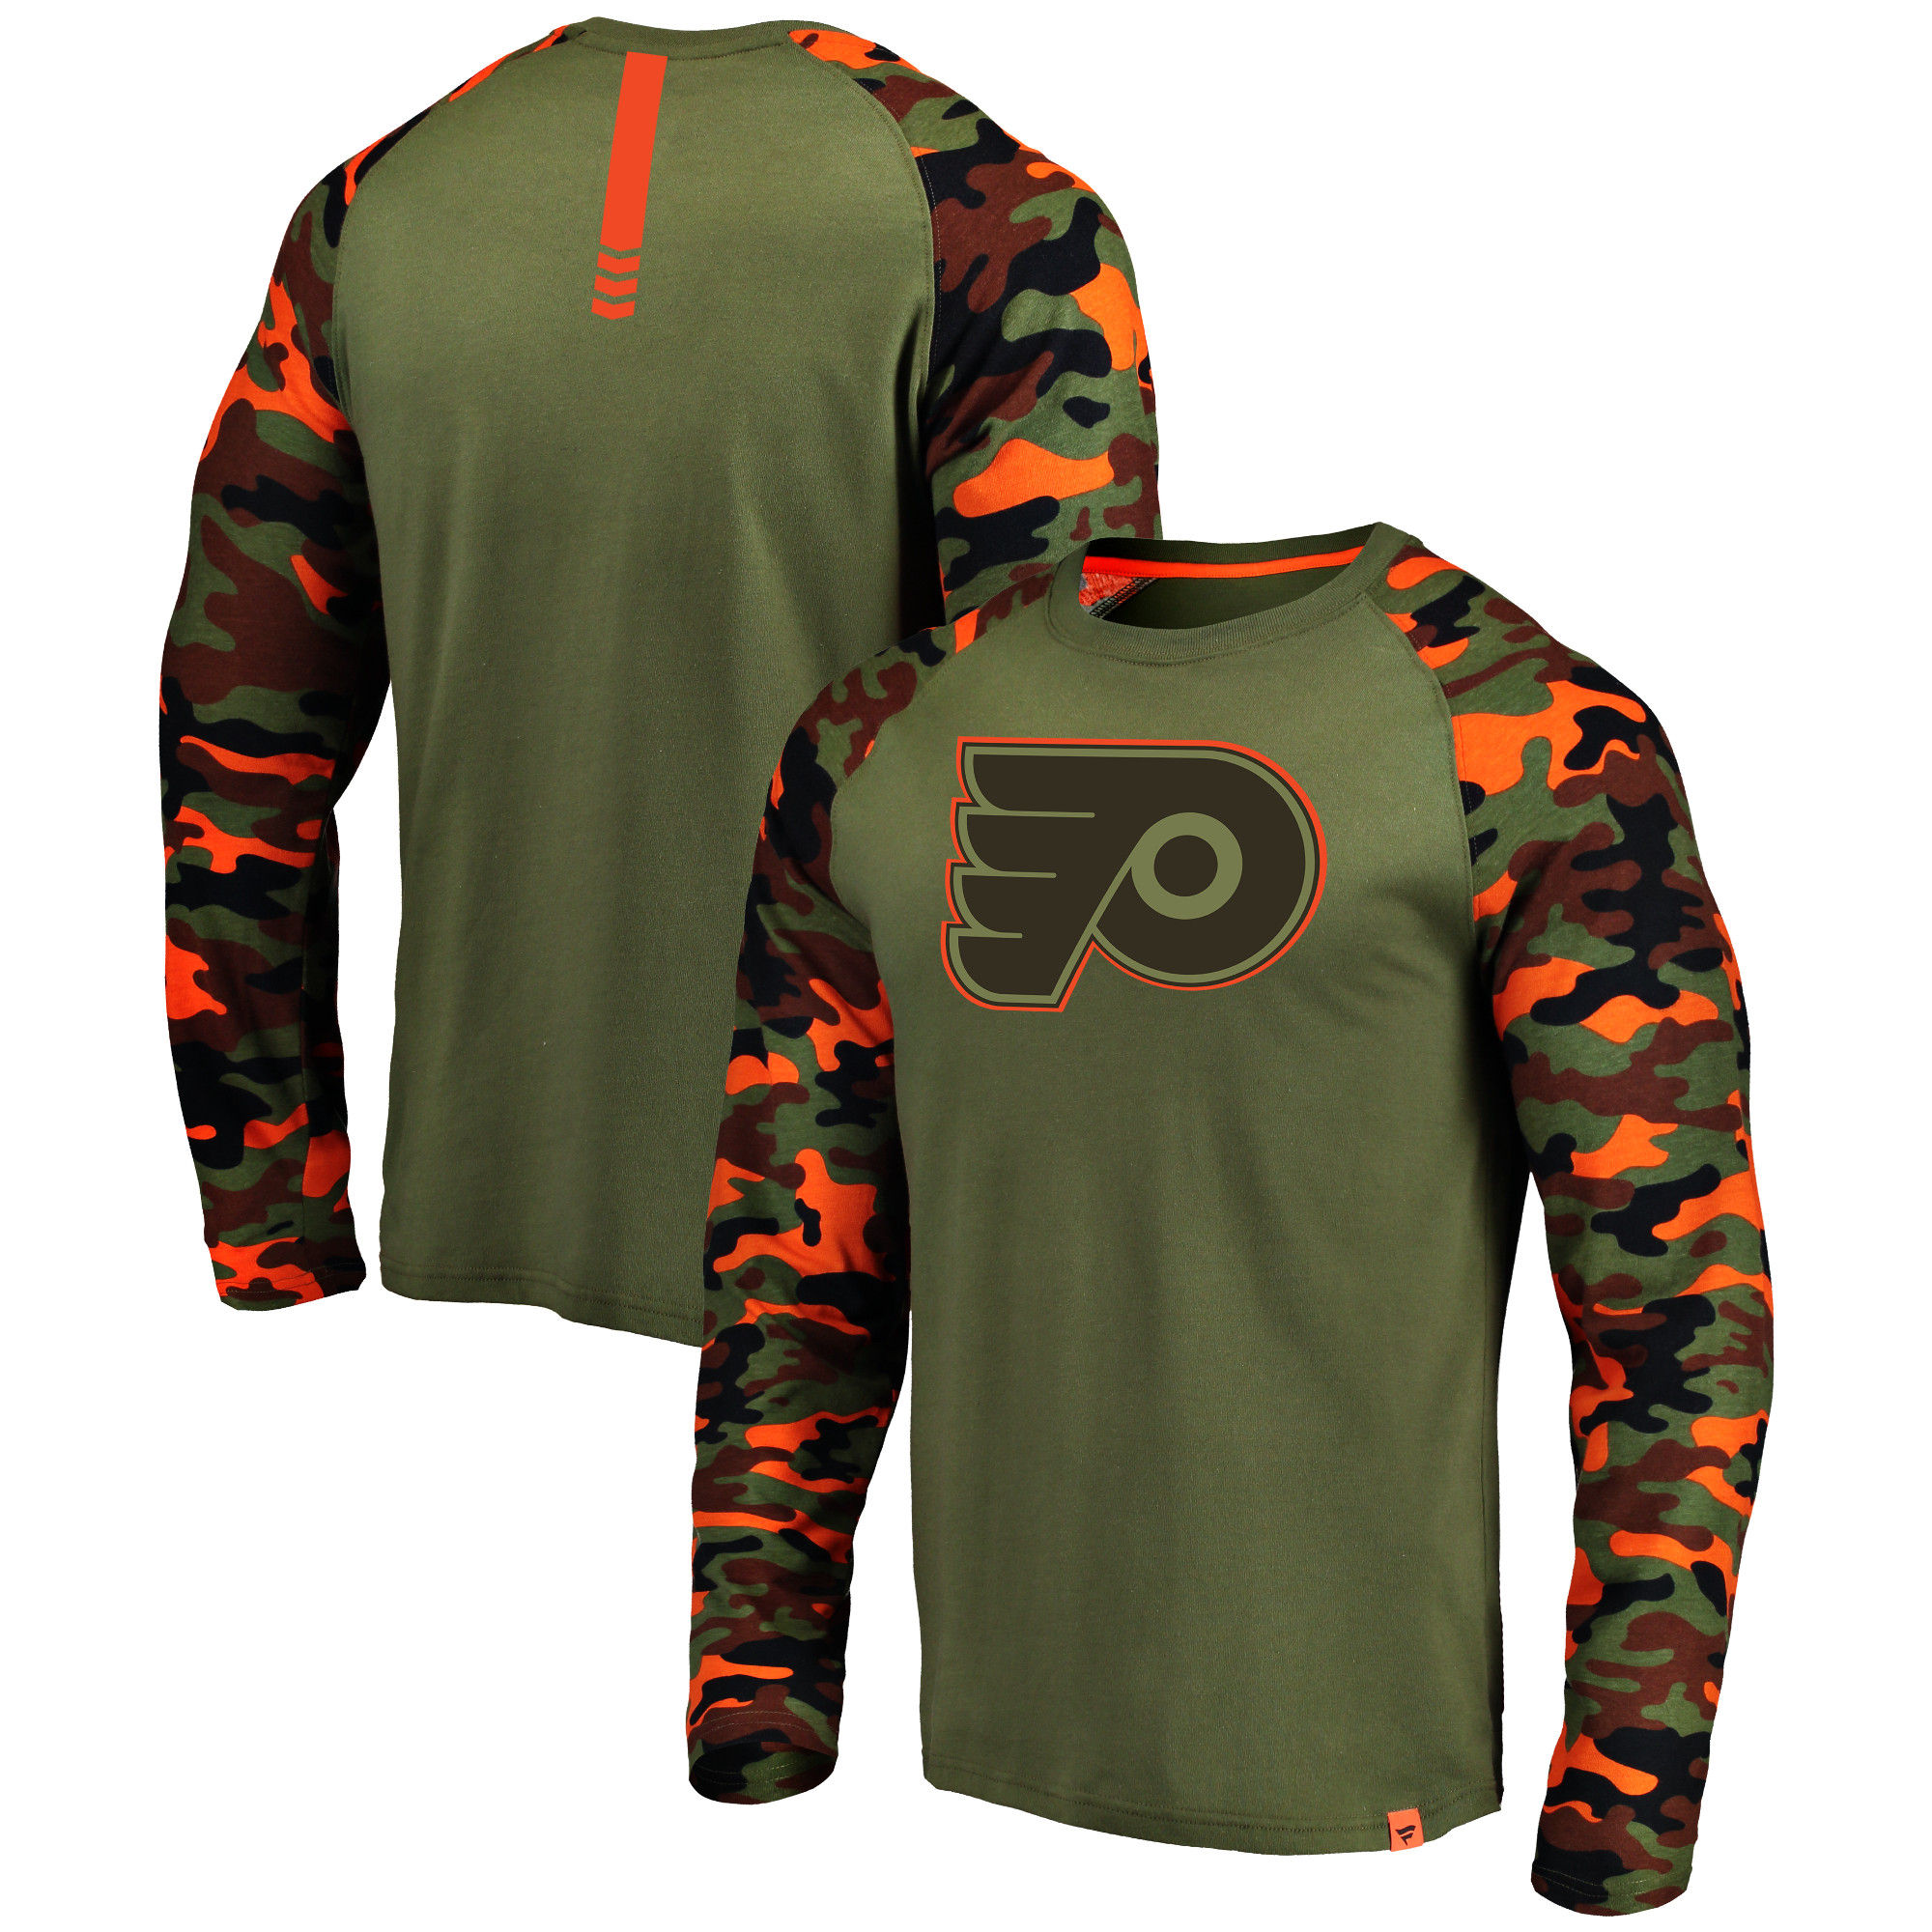 Philadelphia Flyers Fanatics Branded Olive/Camo Recon Long Sleeve Raglan T-Shirt